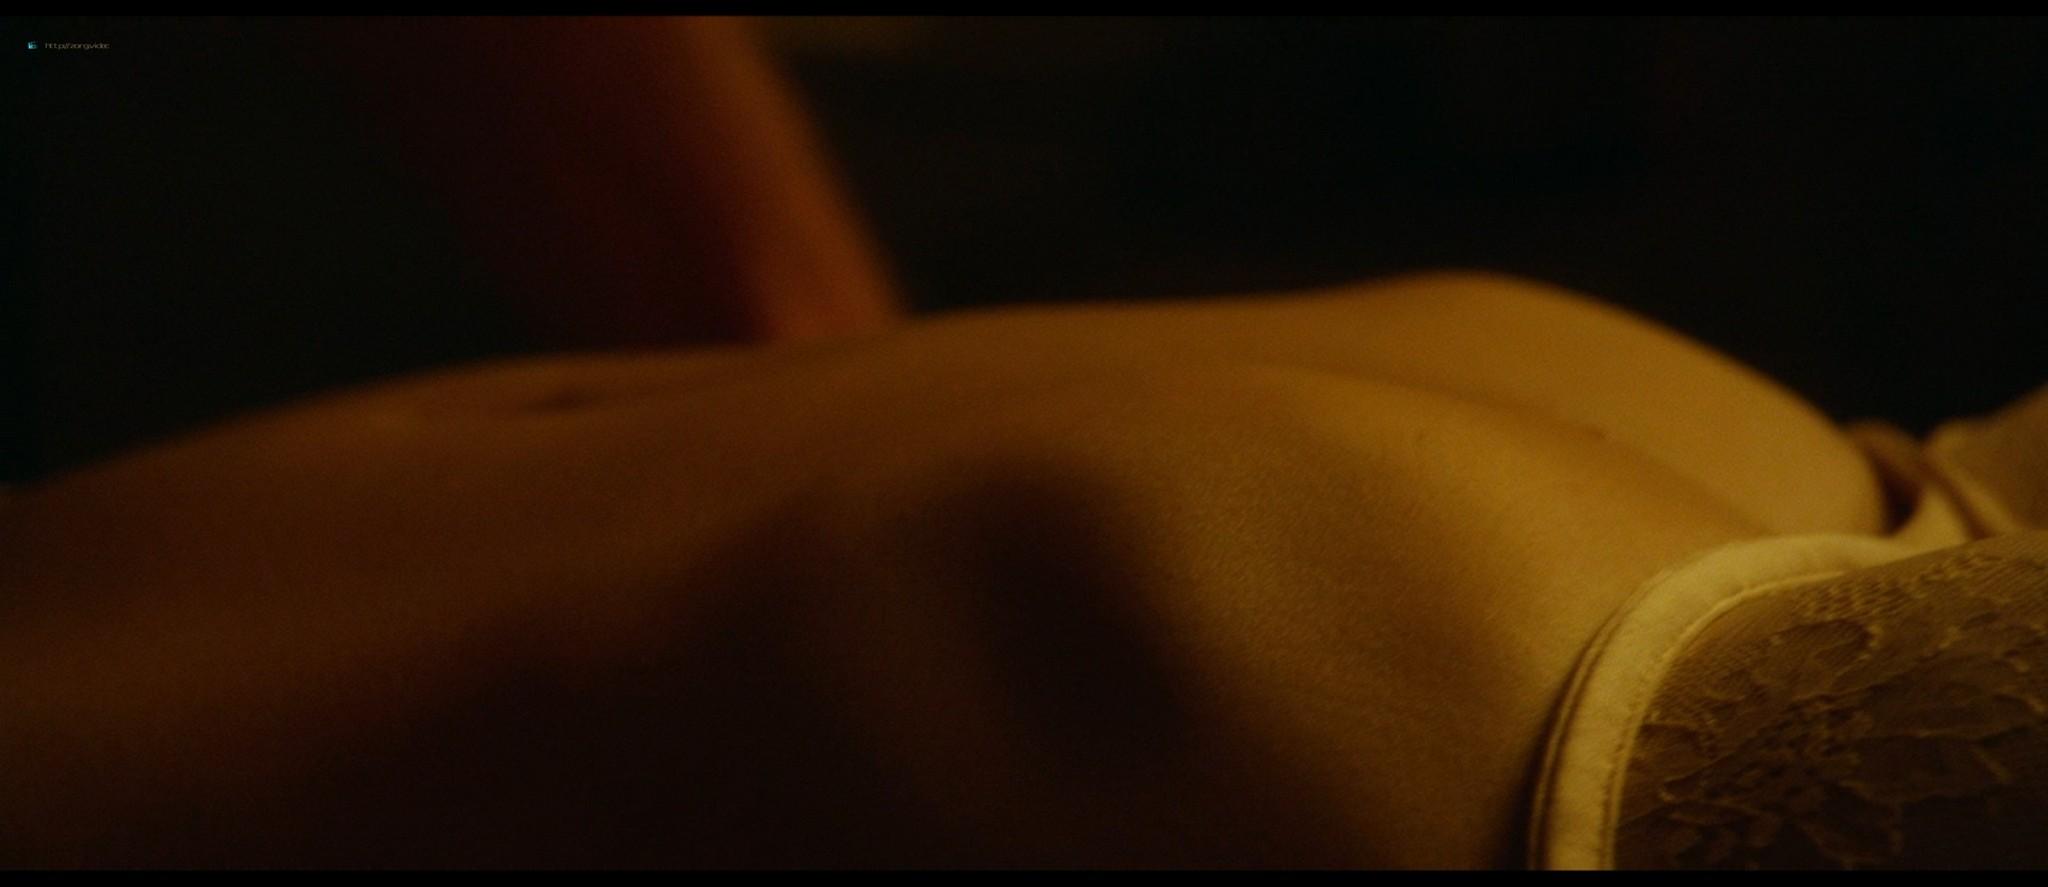 Teresa Palmer hot bikini and Maggie Grace, Alexandra Daddario hot too - The Choice (2016) HD 1080p BluRay (6)